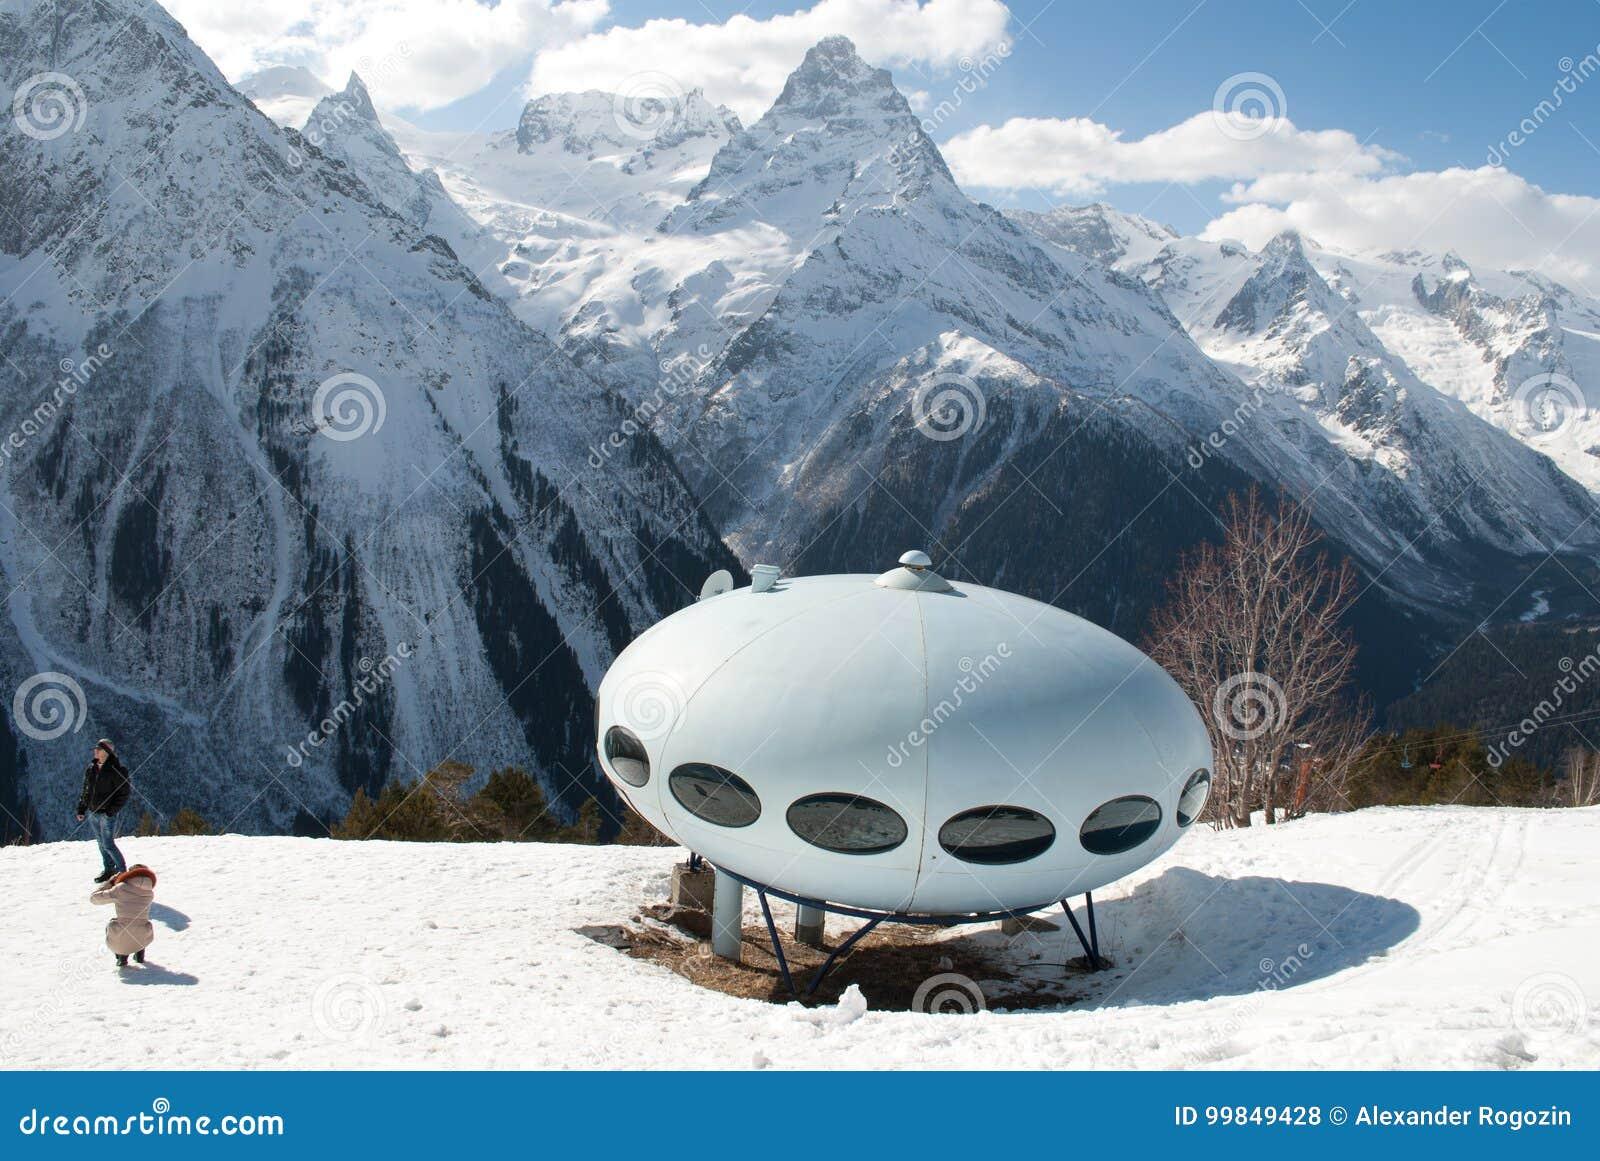 Mountains UFO house